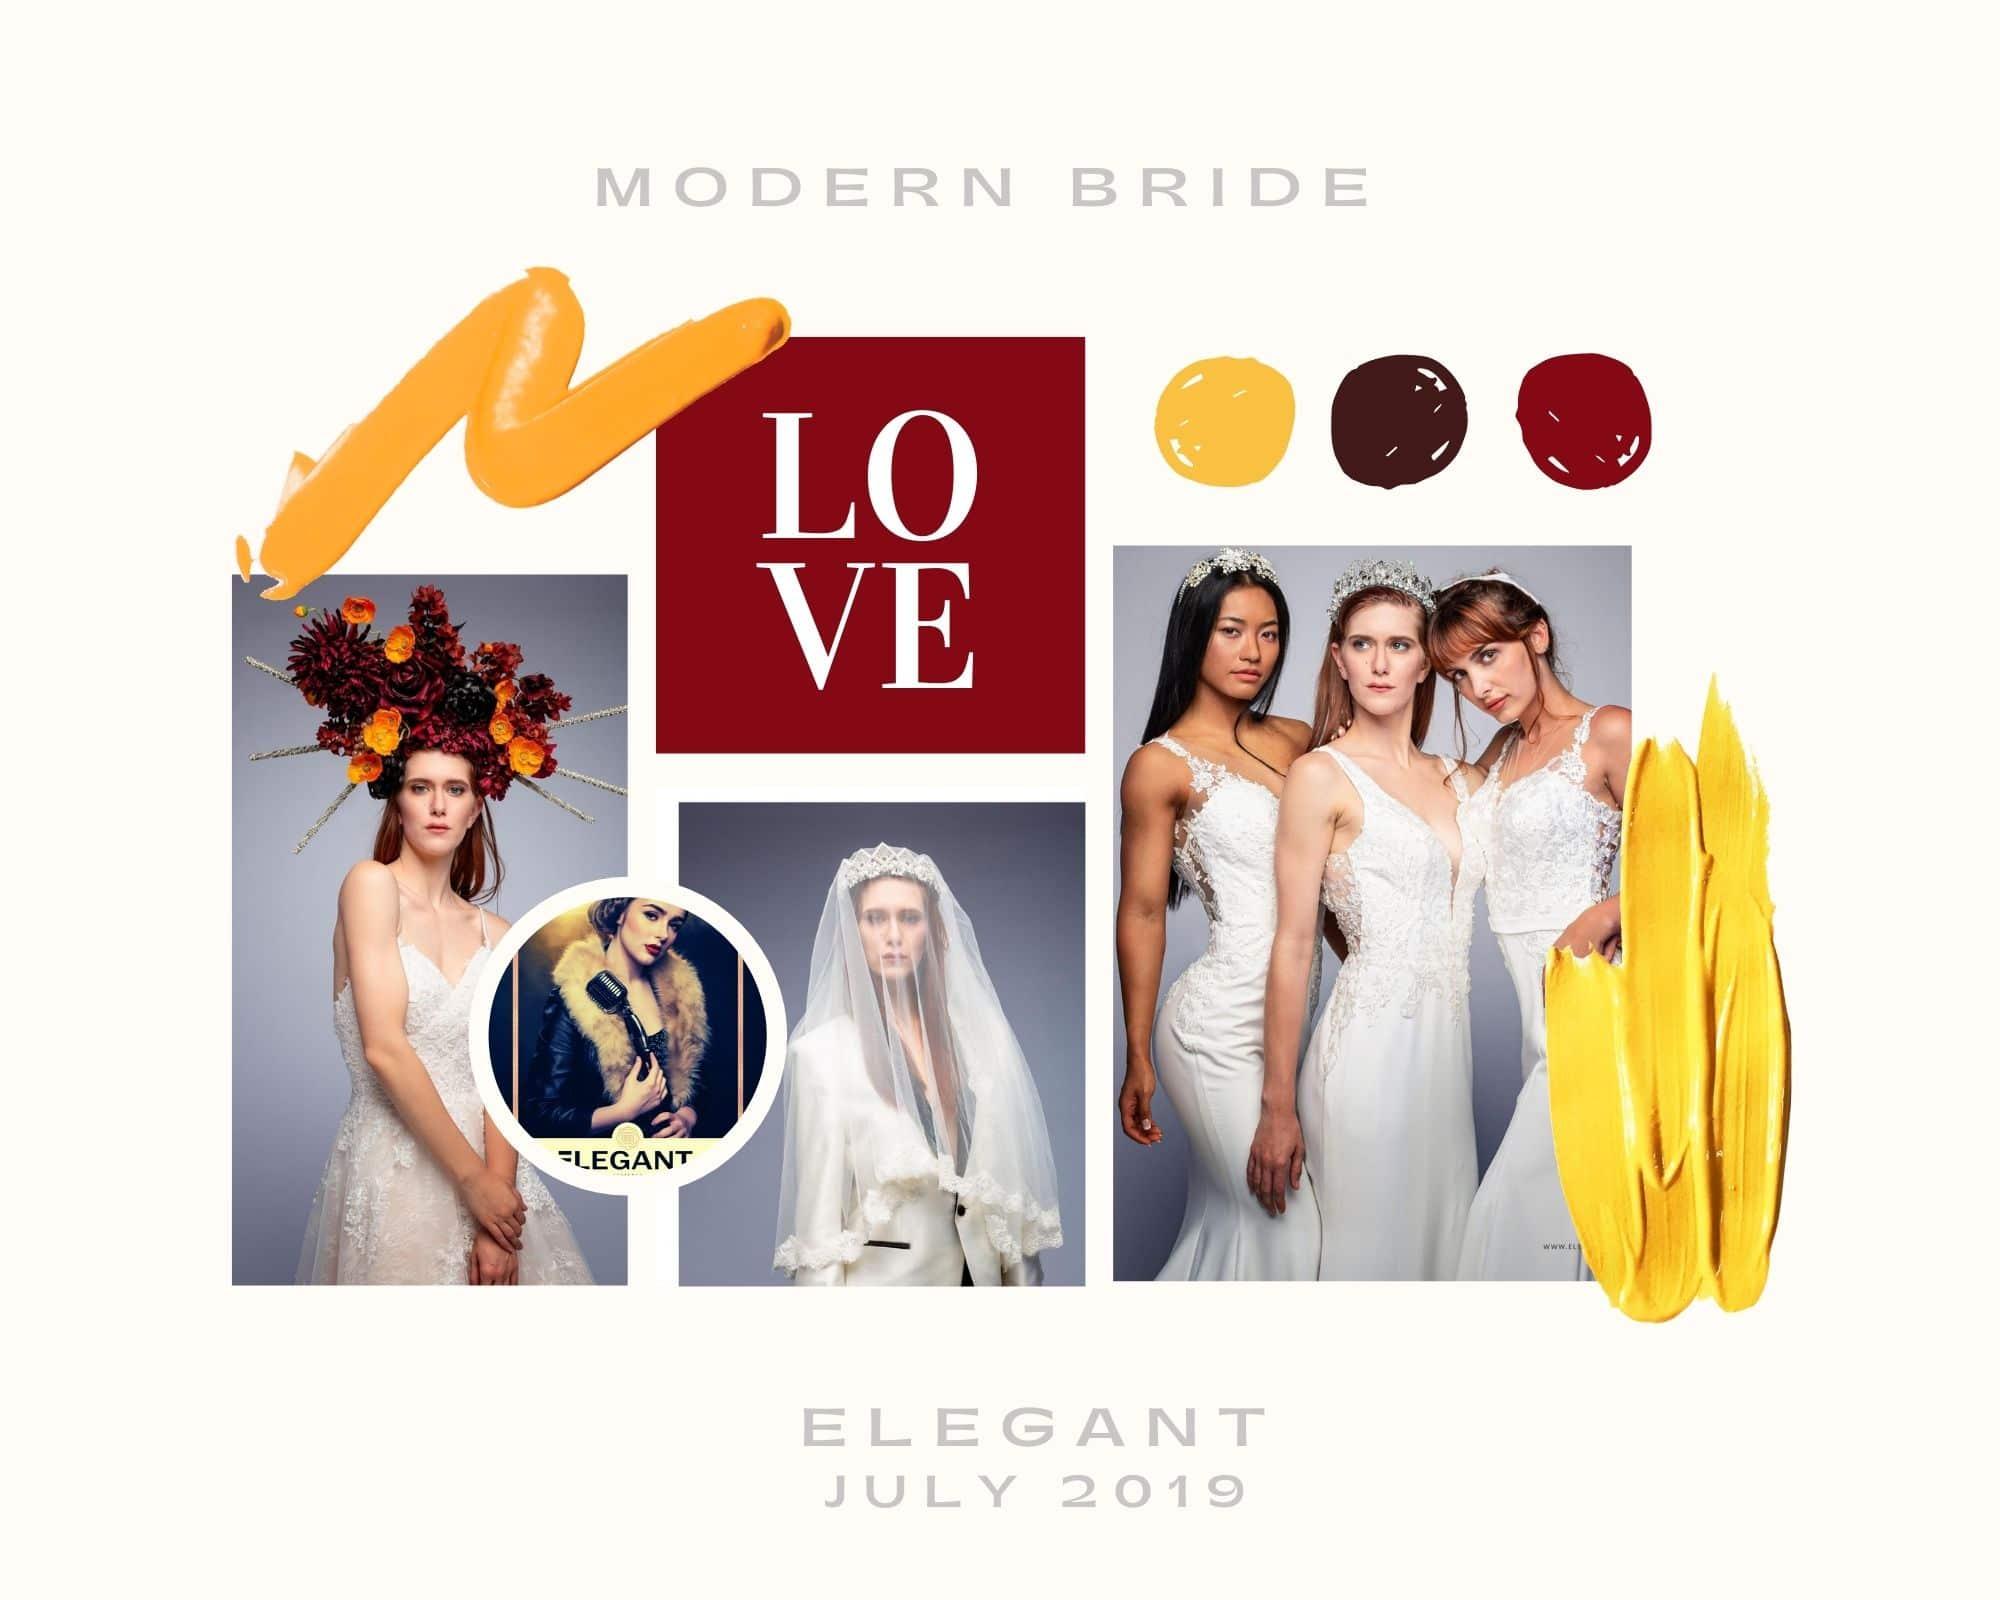 Elegant July 2019